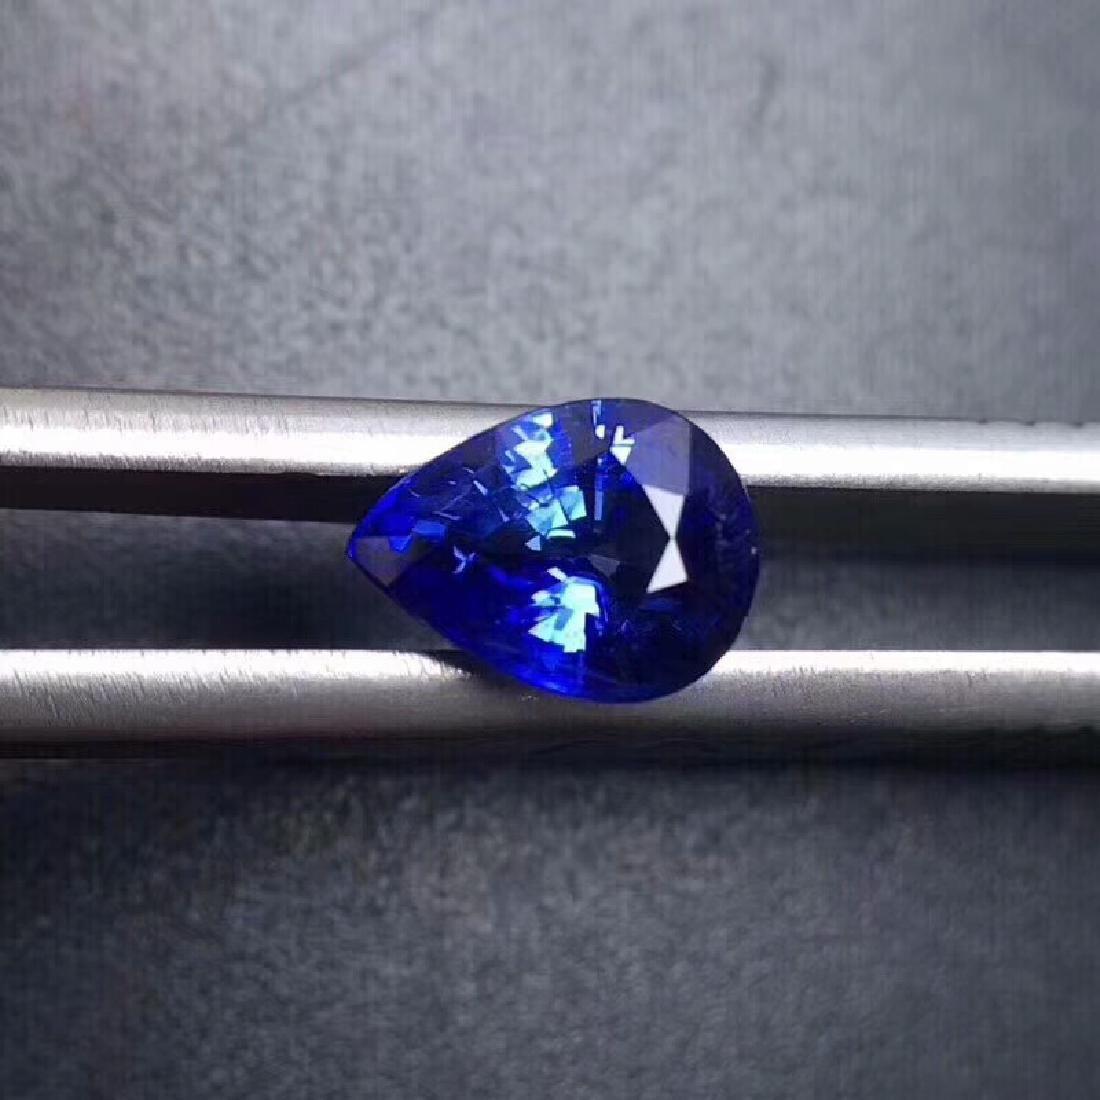 1.40 ct Sapphire 3.7*7.8*5.9 mm Oval Cut